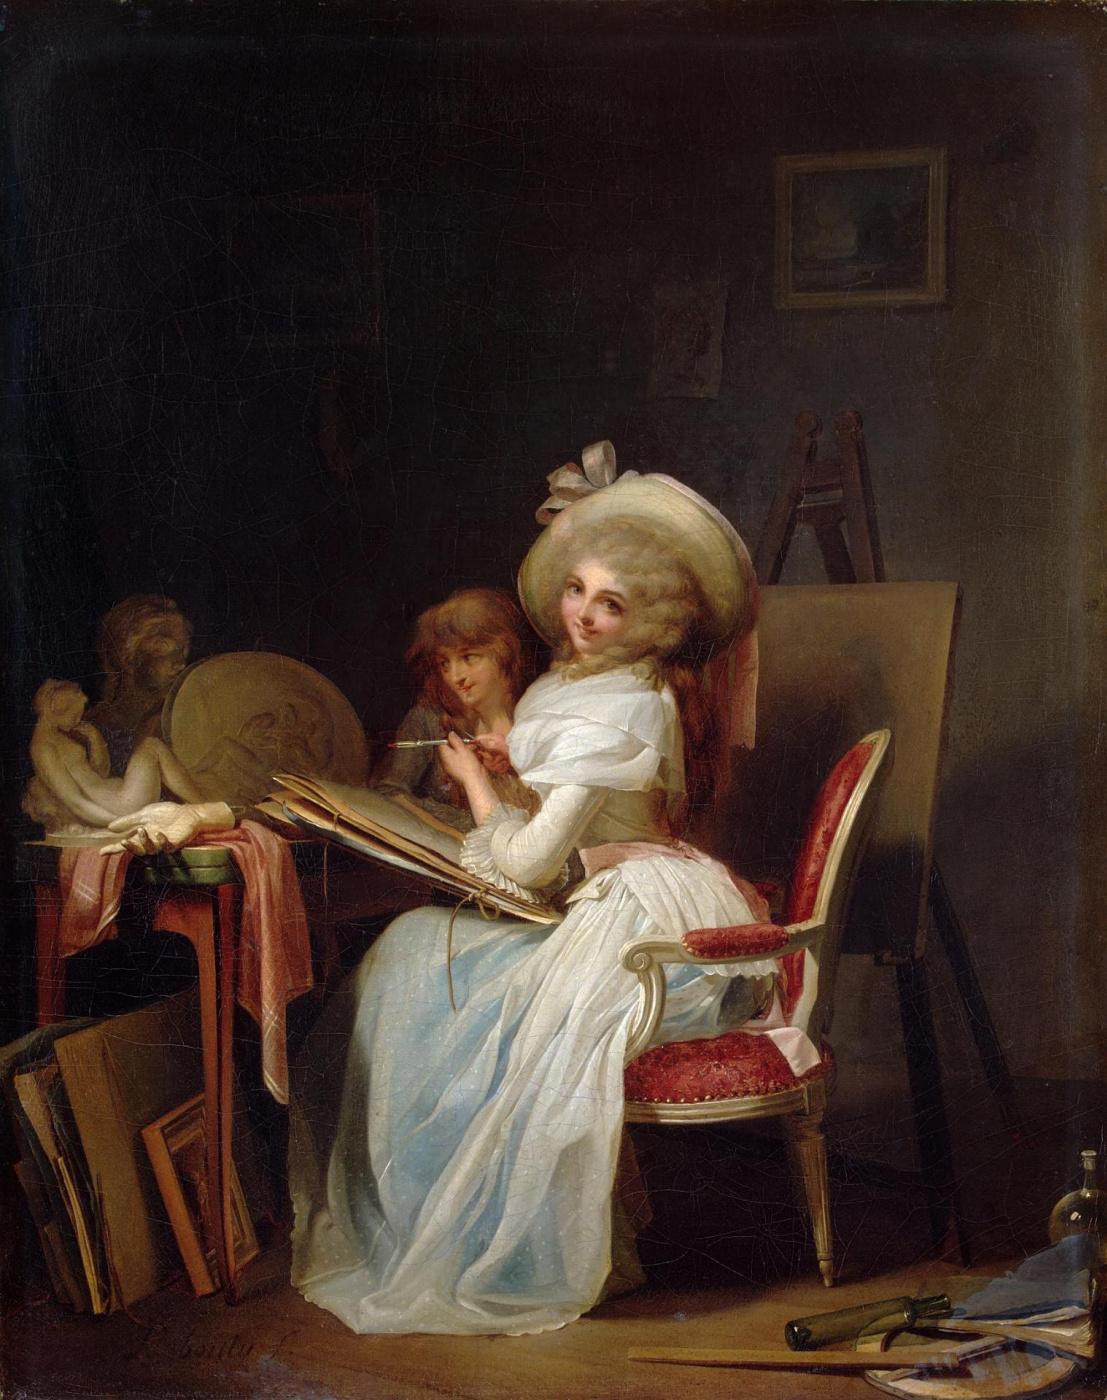 Louis-Leopold Boi. The artist